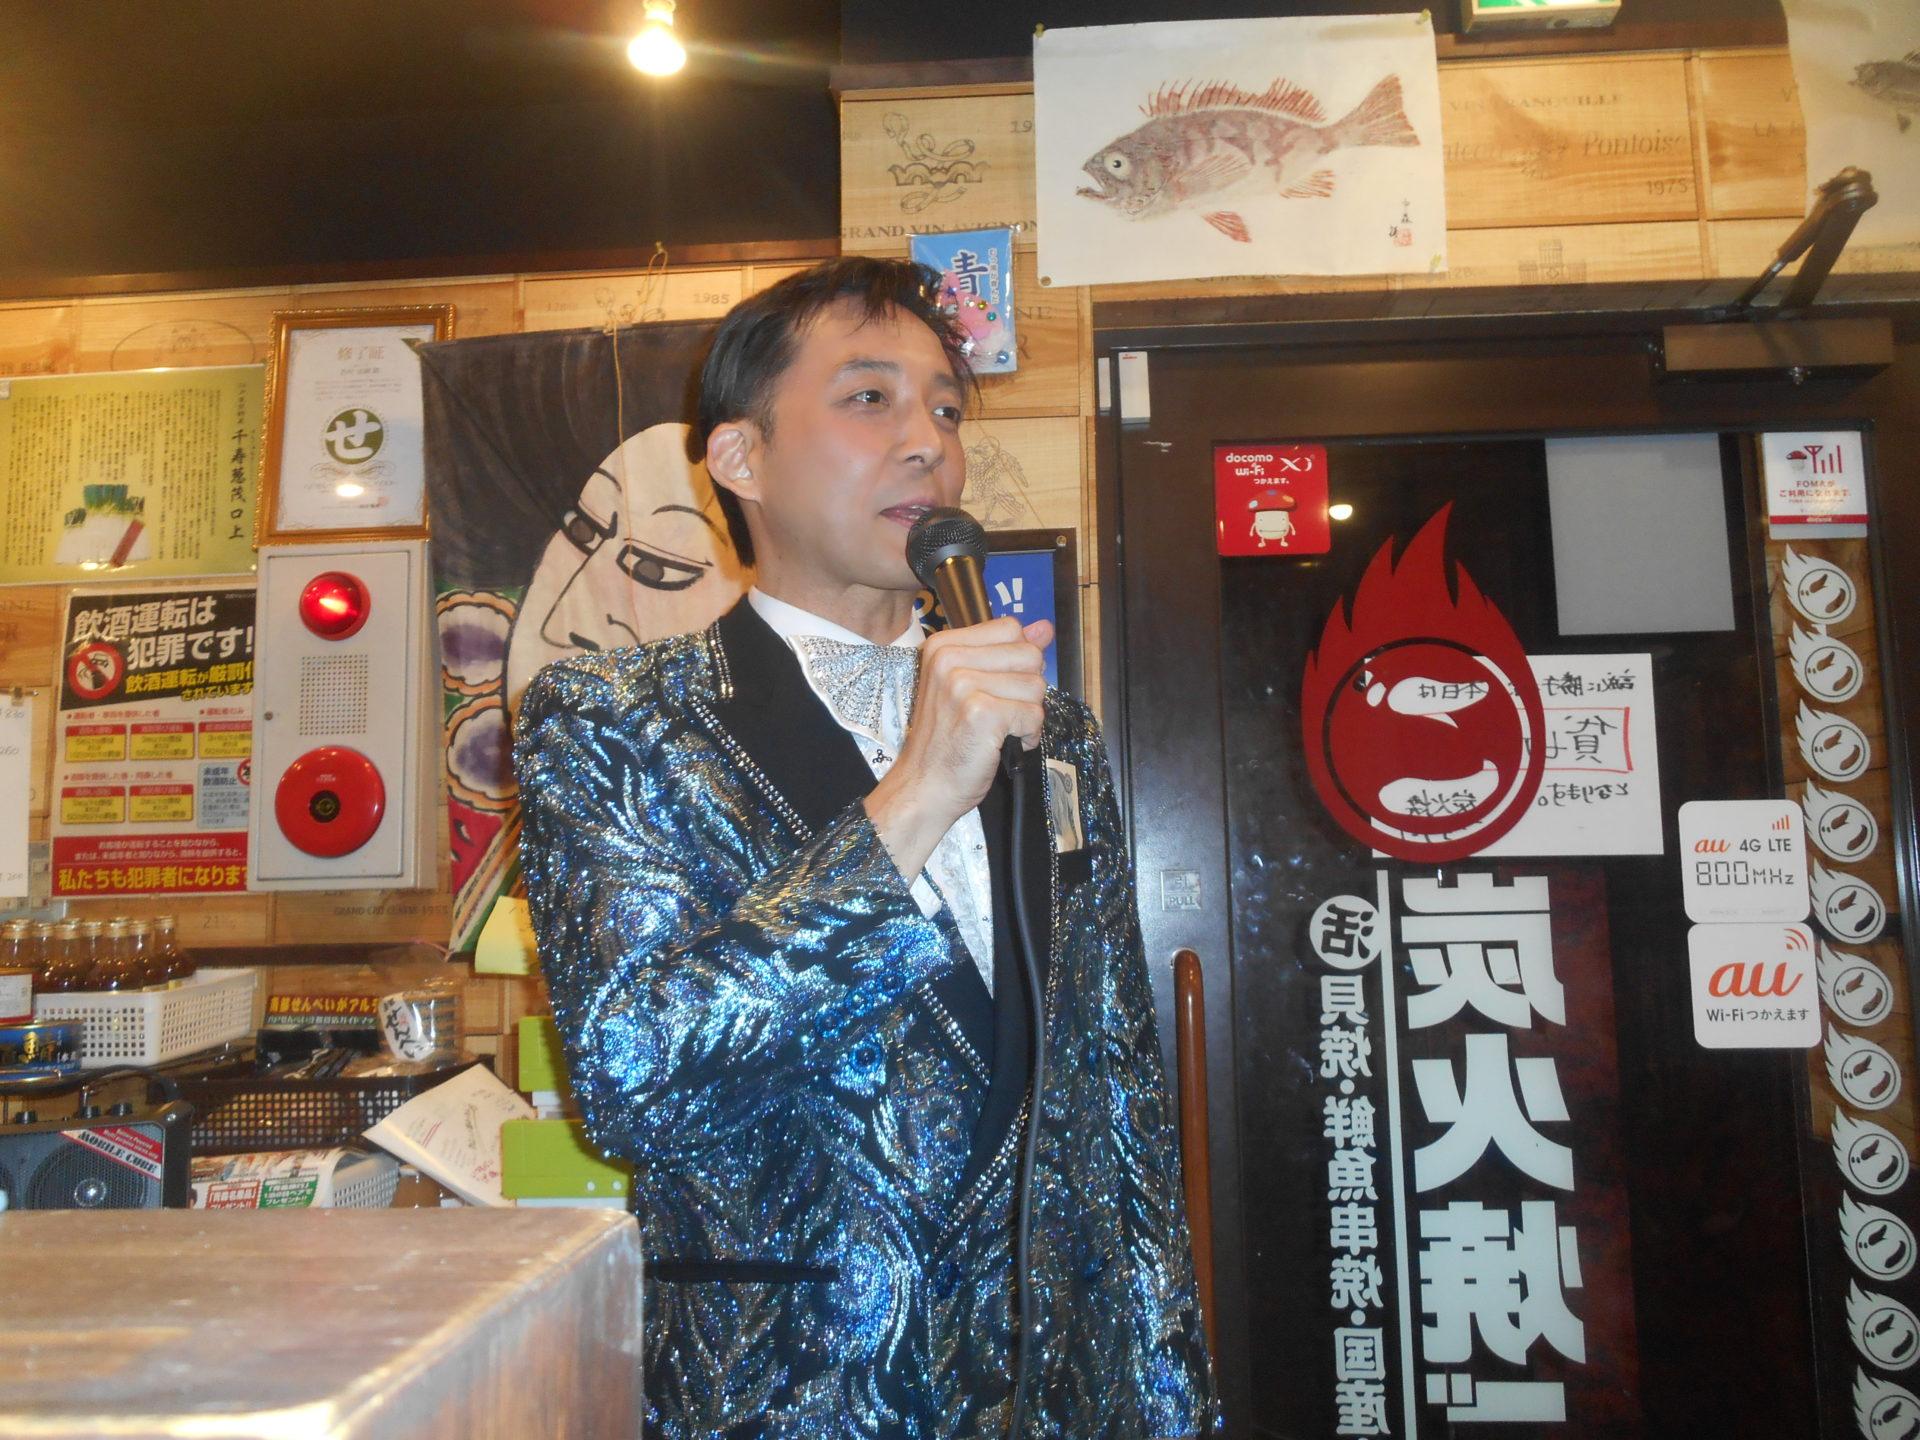 DSCN0621 1920x1440 - 2015年12月21日(月) AOsuki忘年会開催しました。